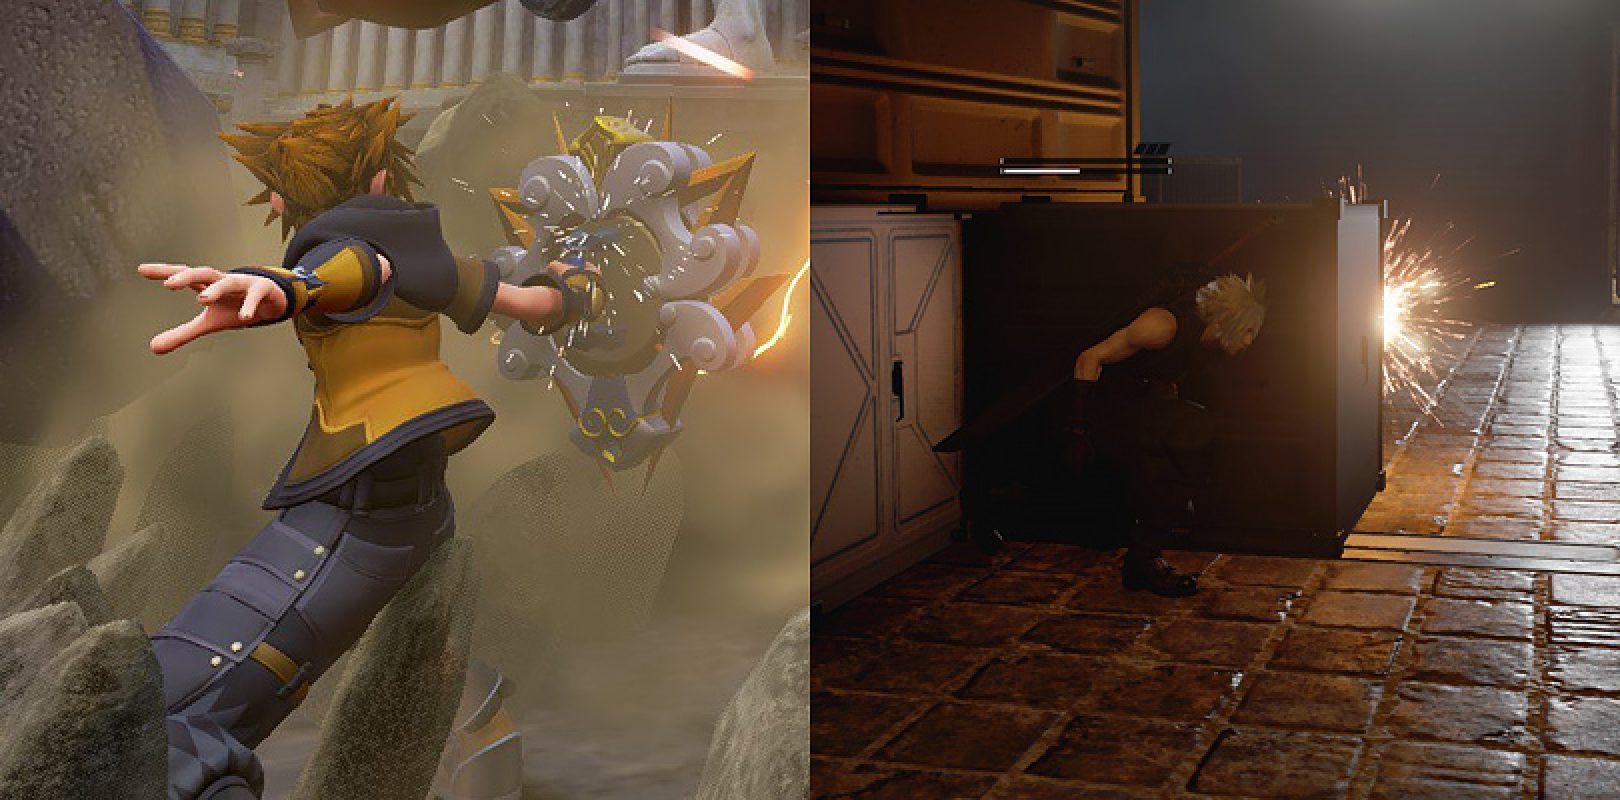 Final Fantasy VII incontri